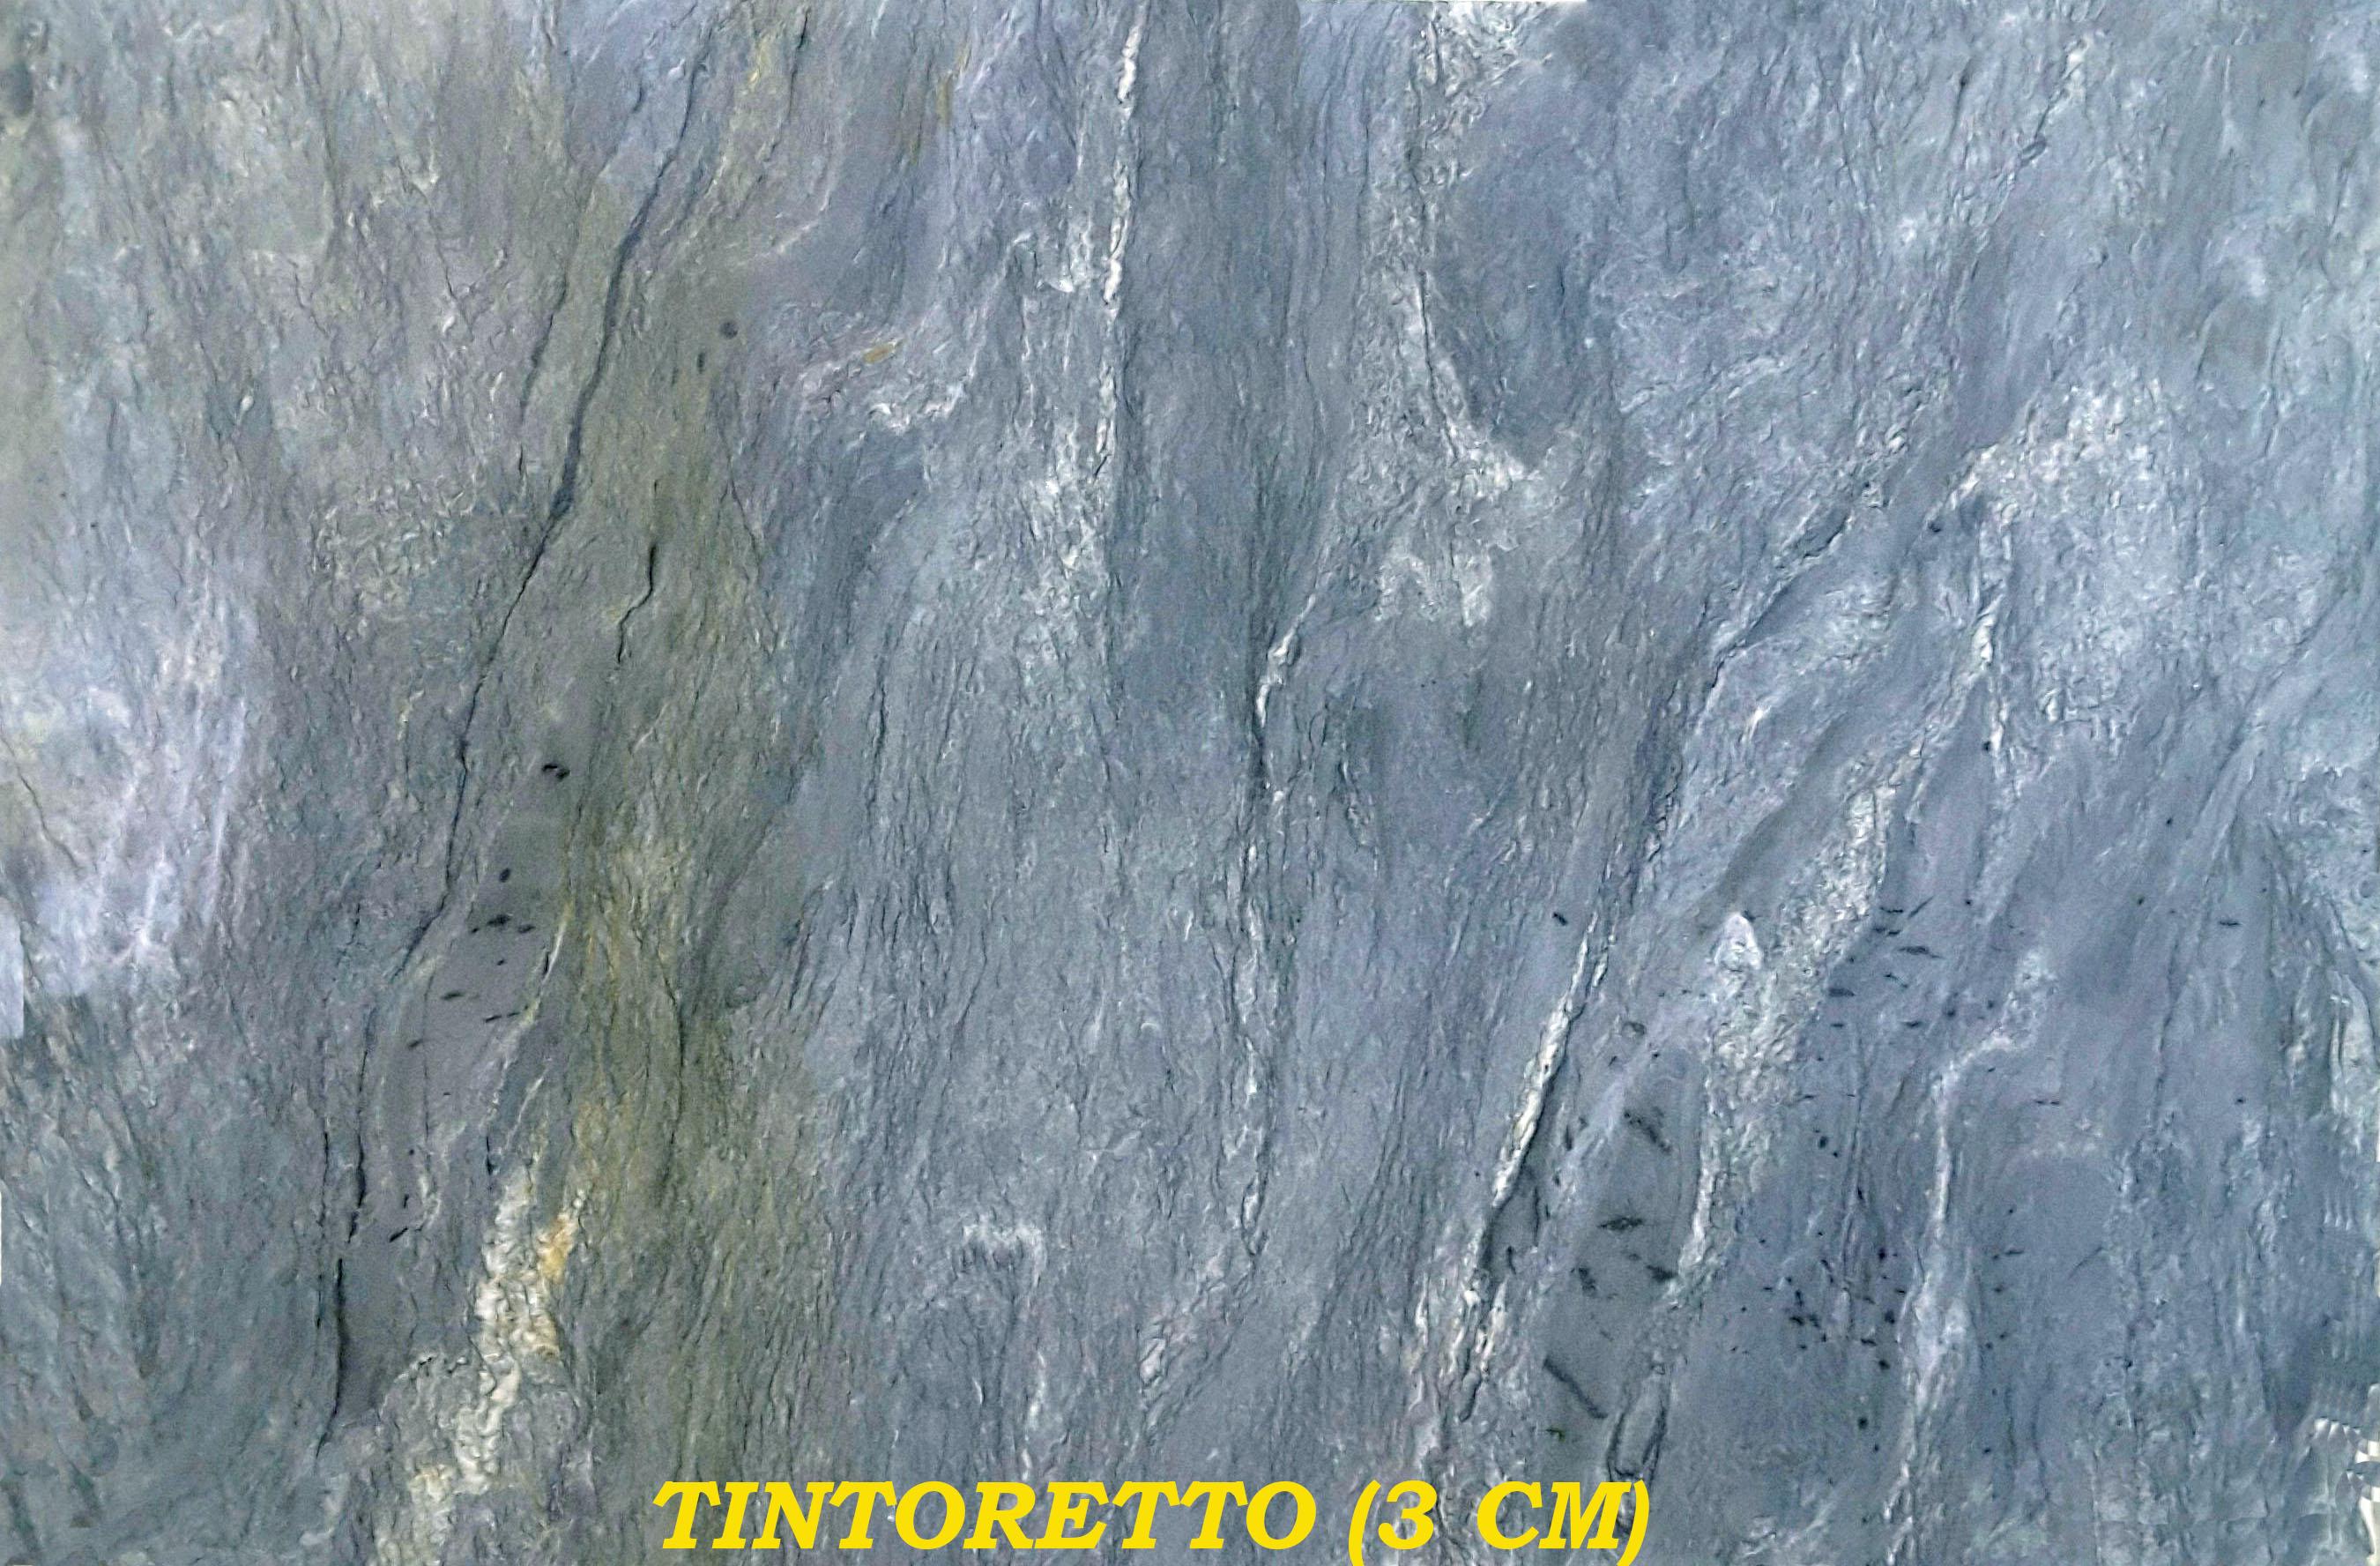 TINTORETTO ( 3CM)-#4635